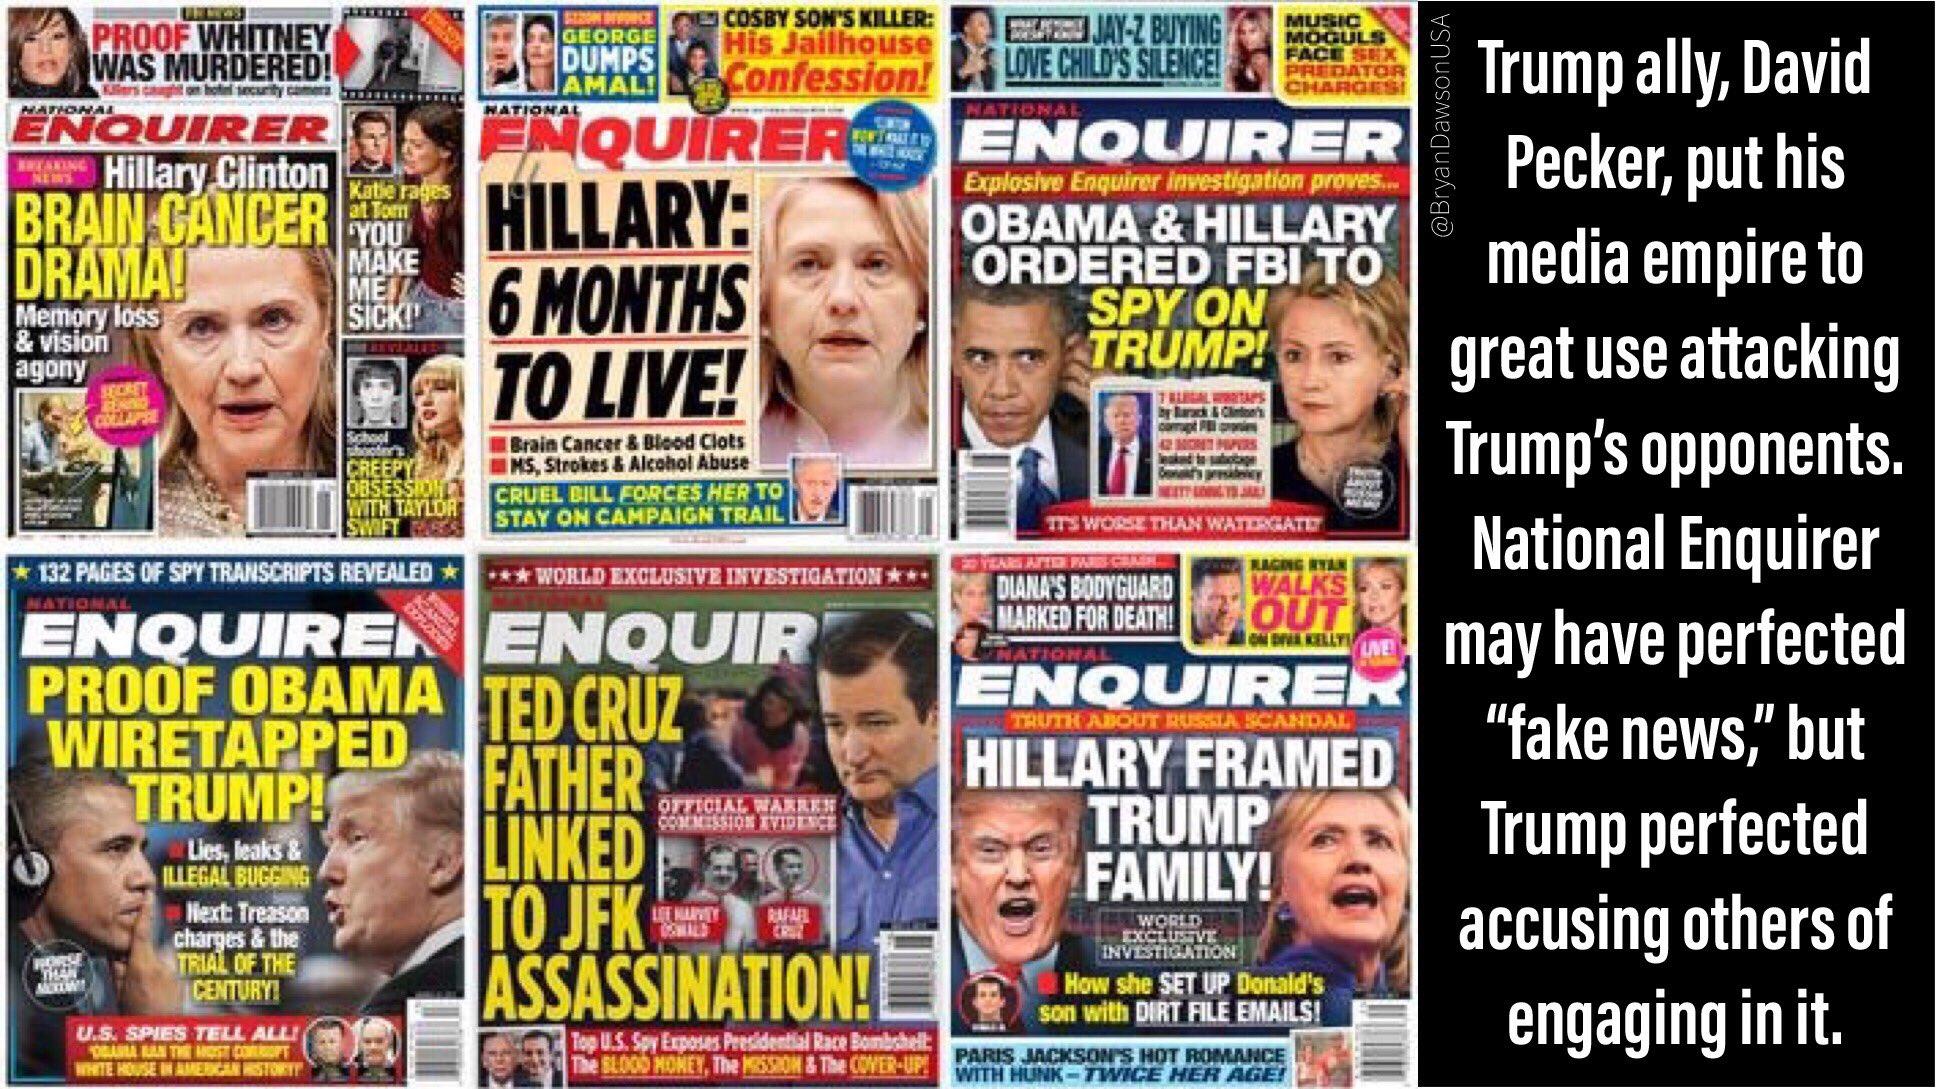 Looks like @JeffBezos has Trump by the Pecker  #PeckerProblem https://www.cnn.com/2019/02/07/media/jeff-bezos-ami-blackmail/index.html